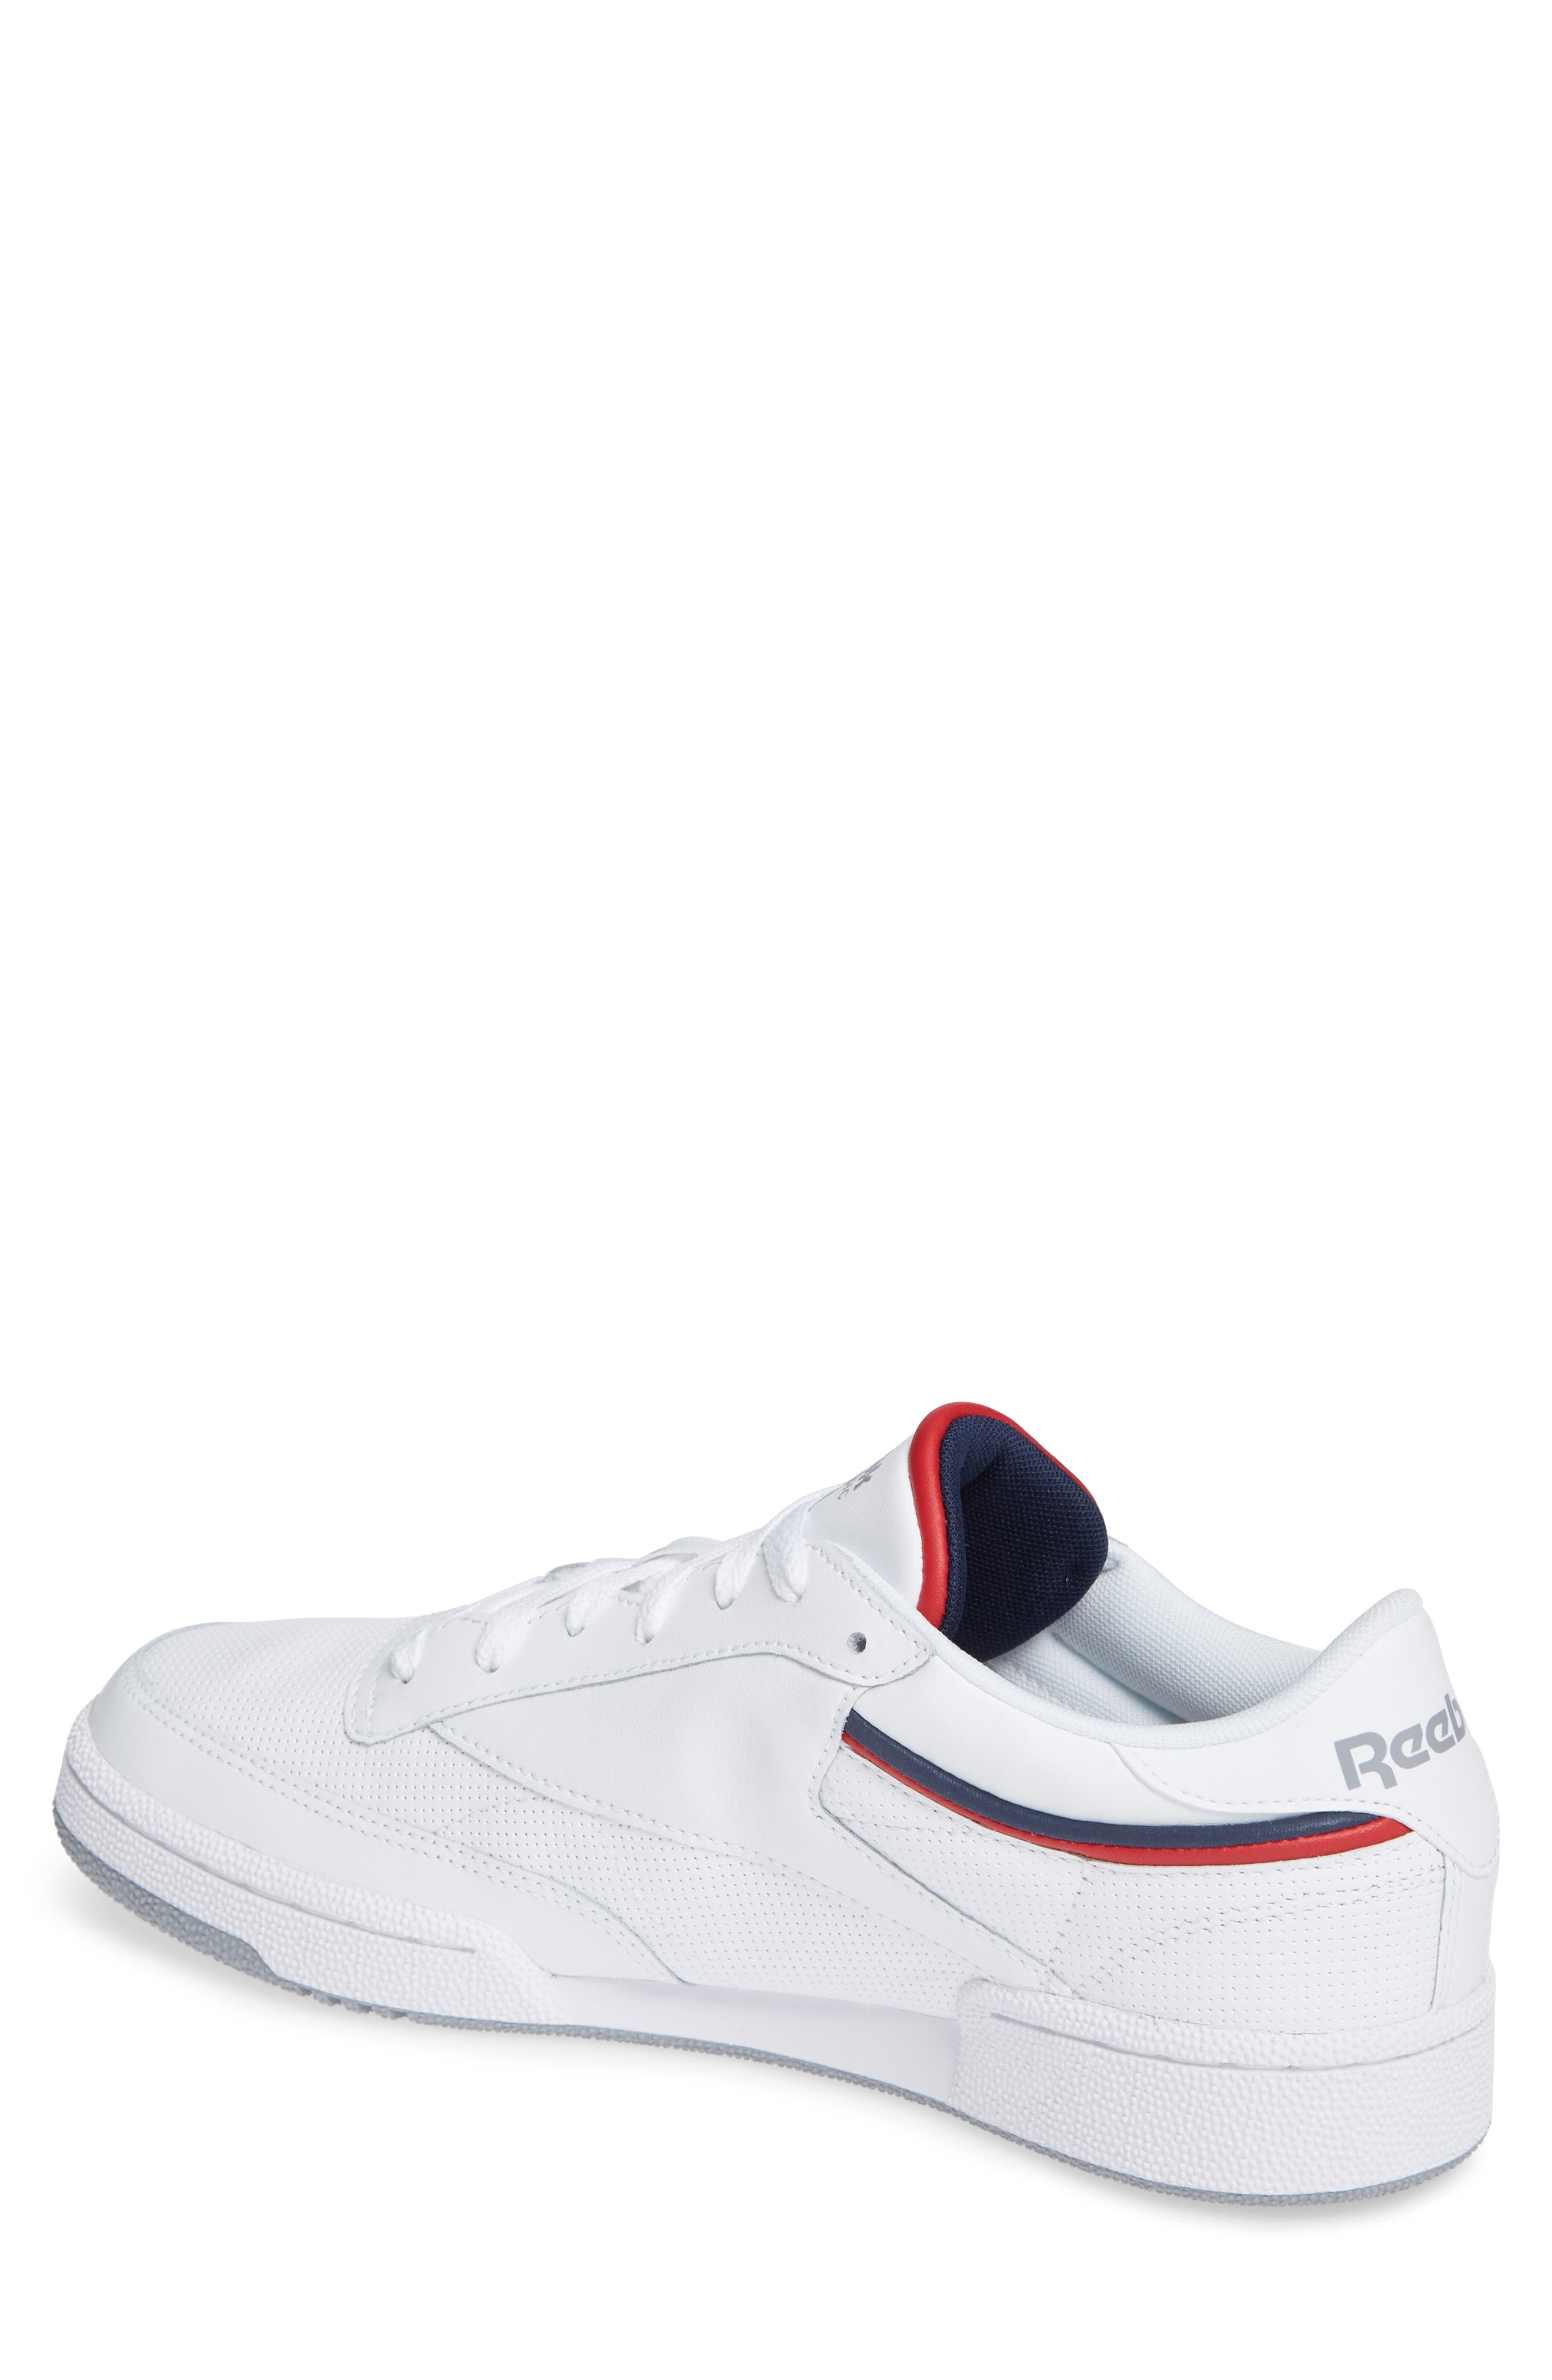 Club C 85 Sneaker,                             Alternate thumbnail 2, color,                             WHITE/ COLLEGIATE NAVY/ RED